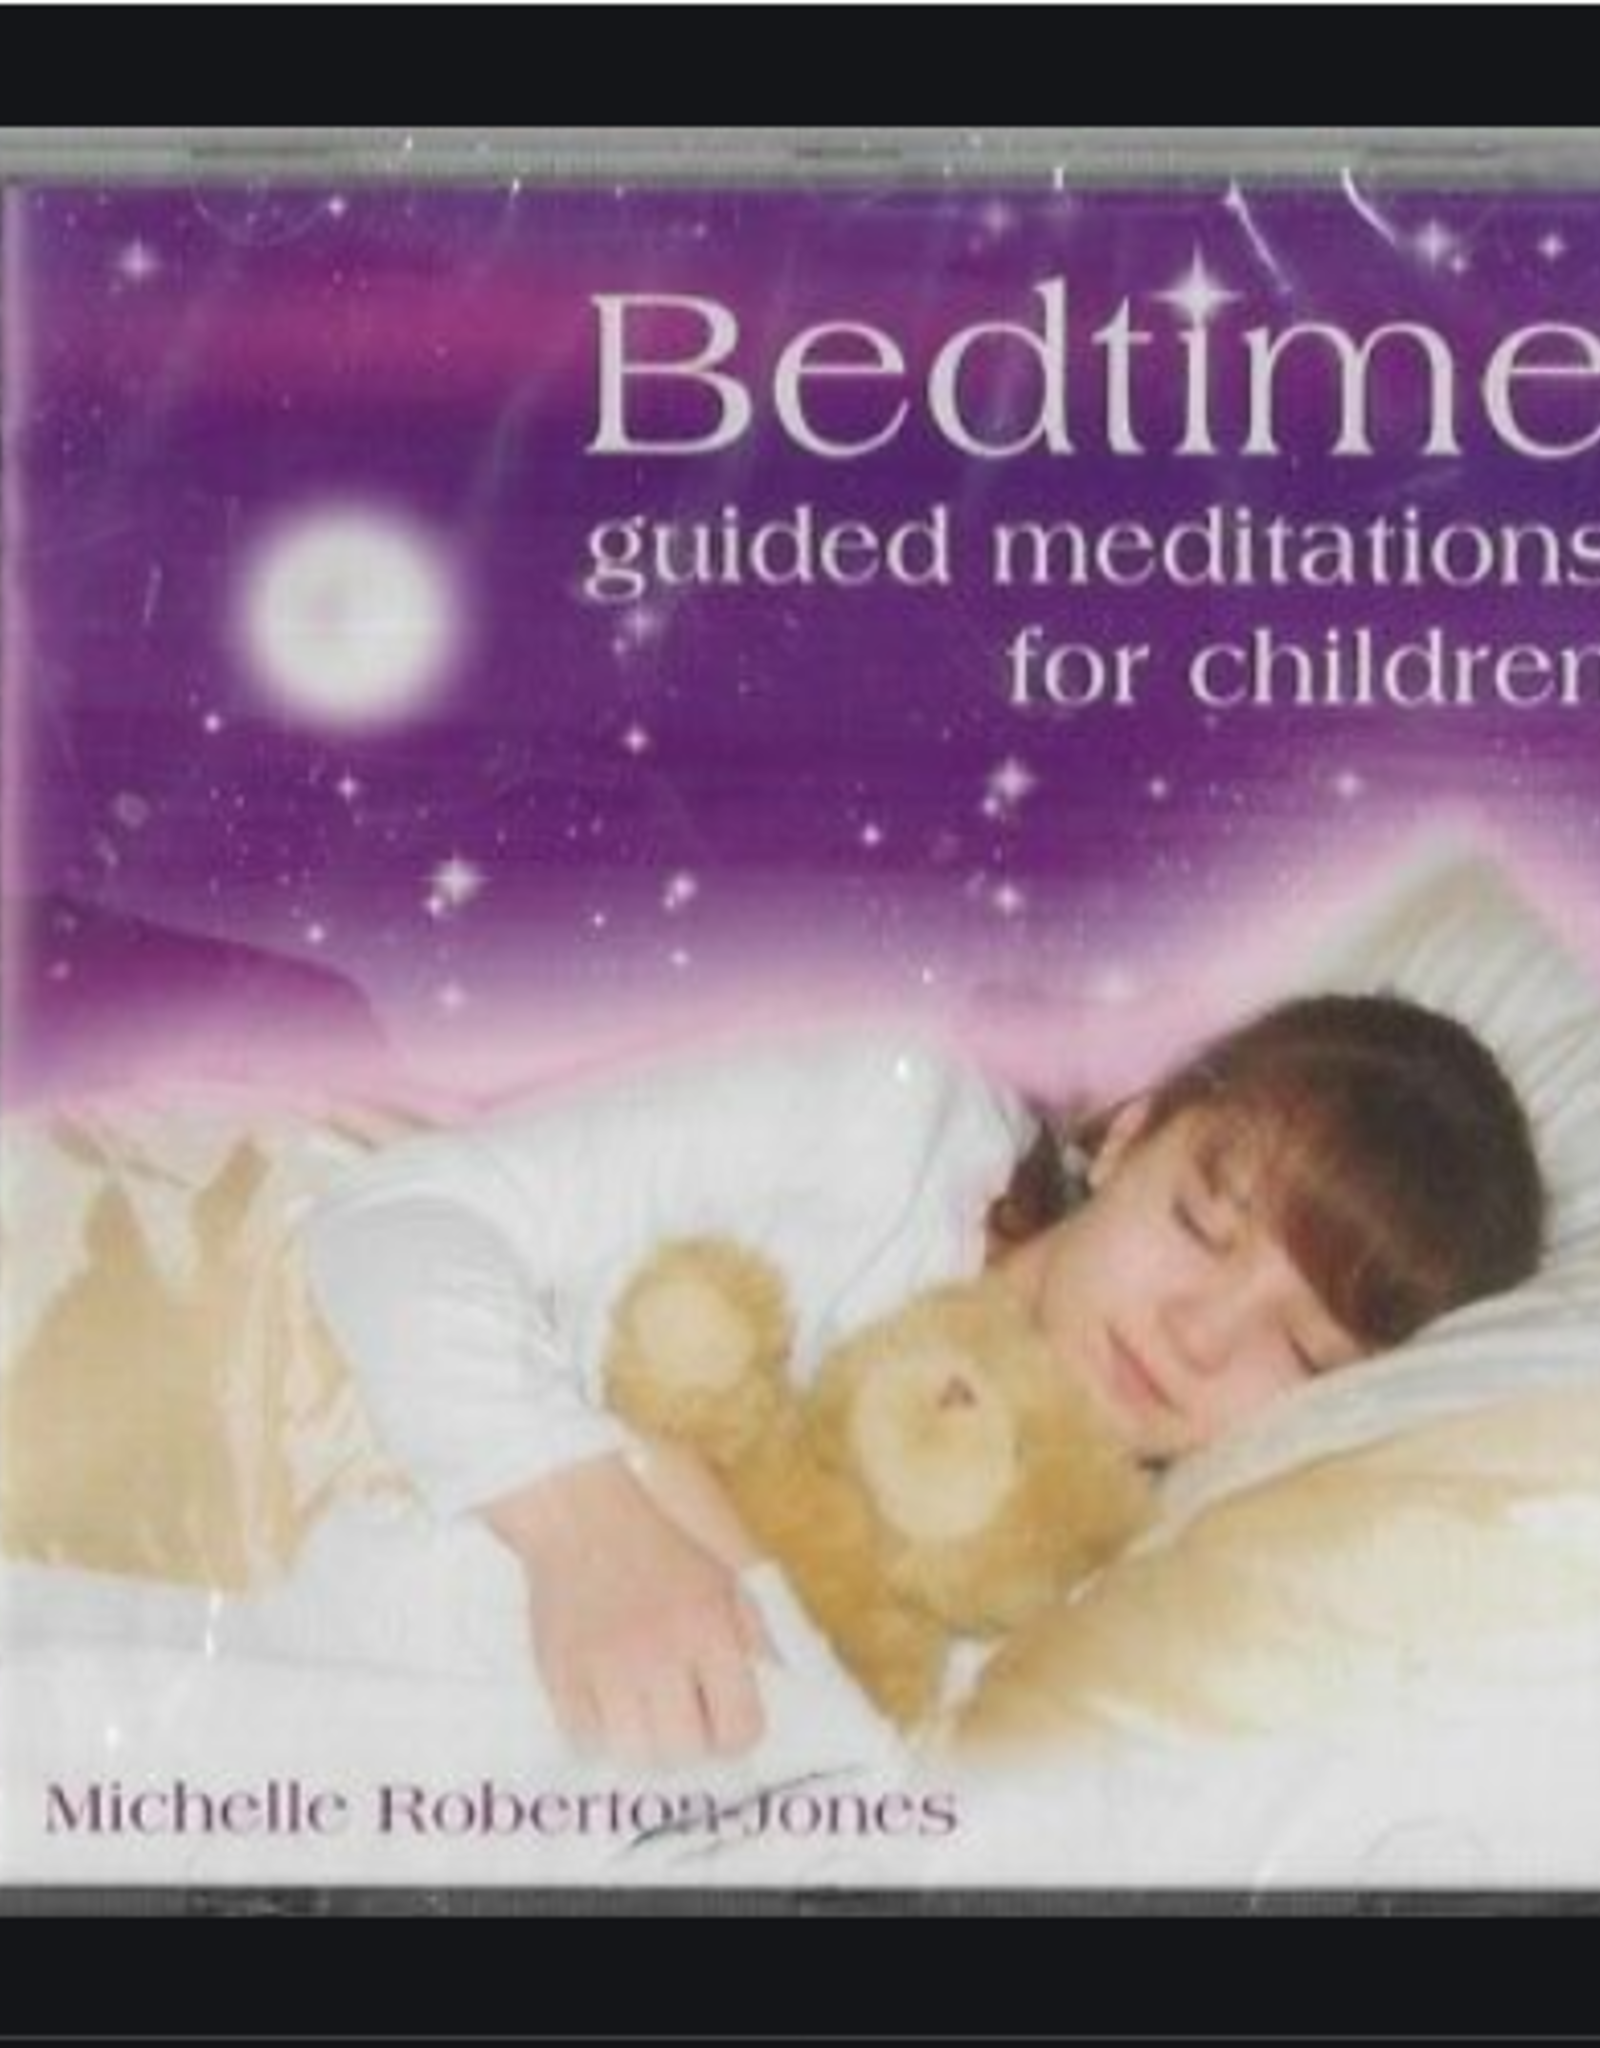 Michelle Roberton-Jones Bedtime Guided Meditations for Children CD by Michelle Roberton-Jones